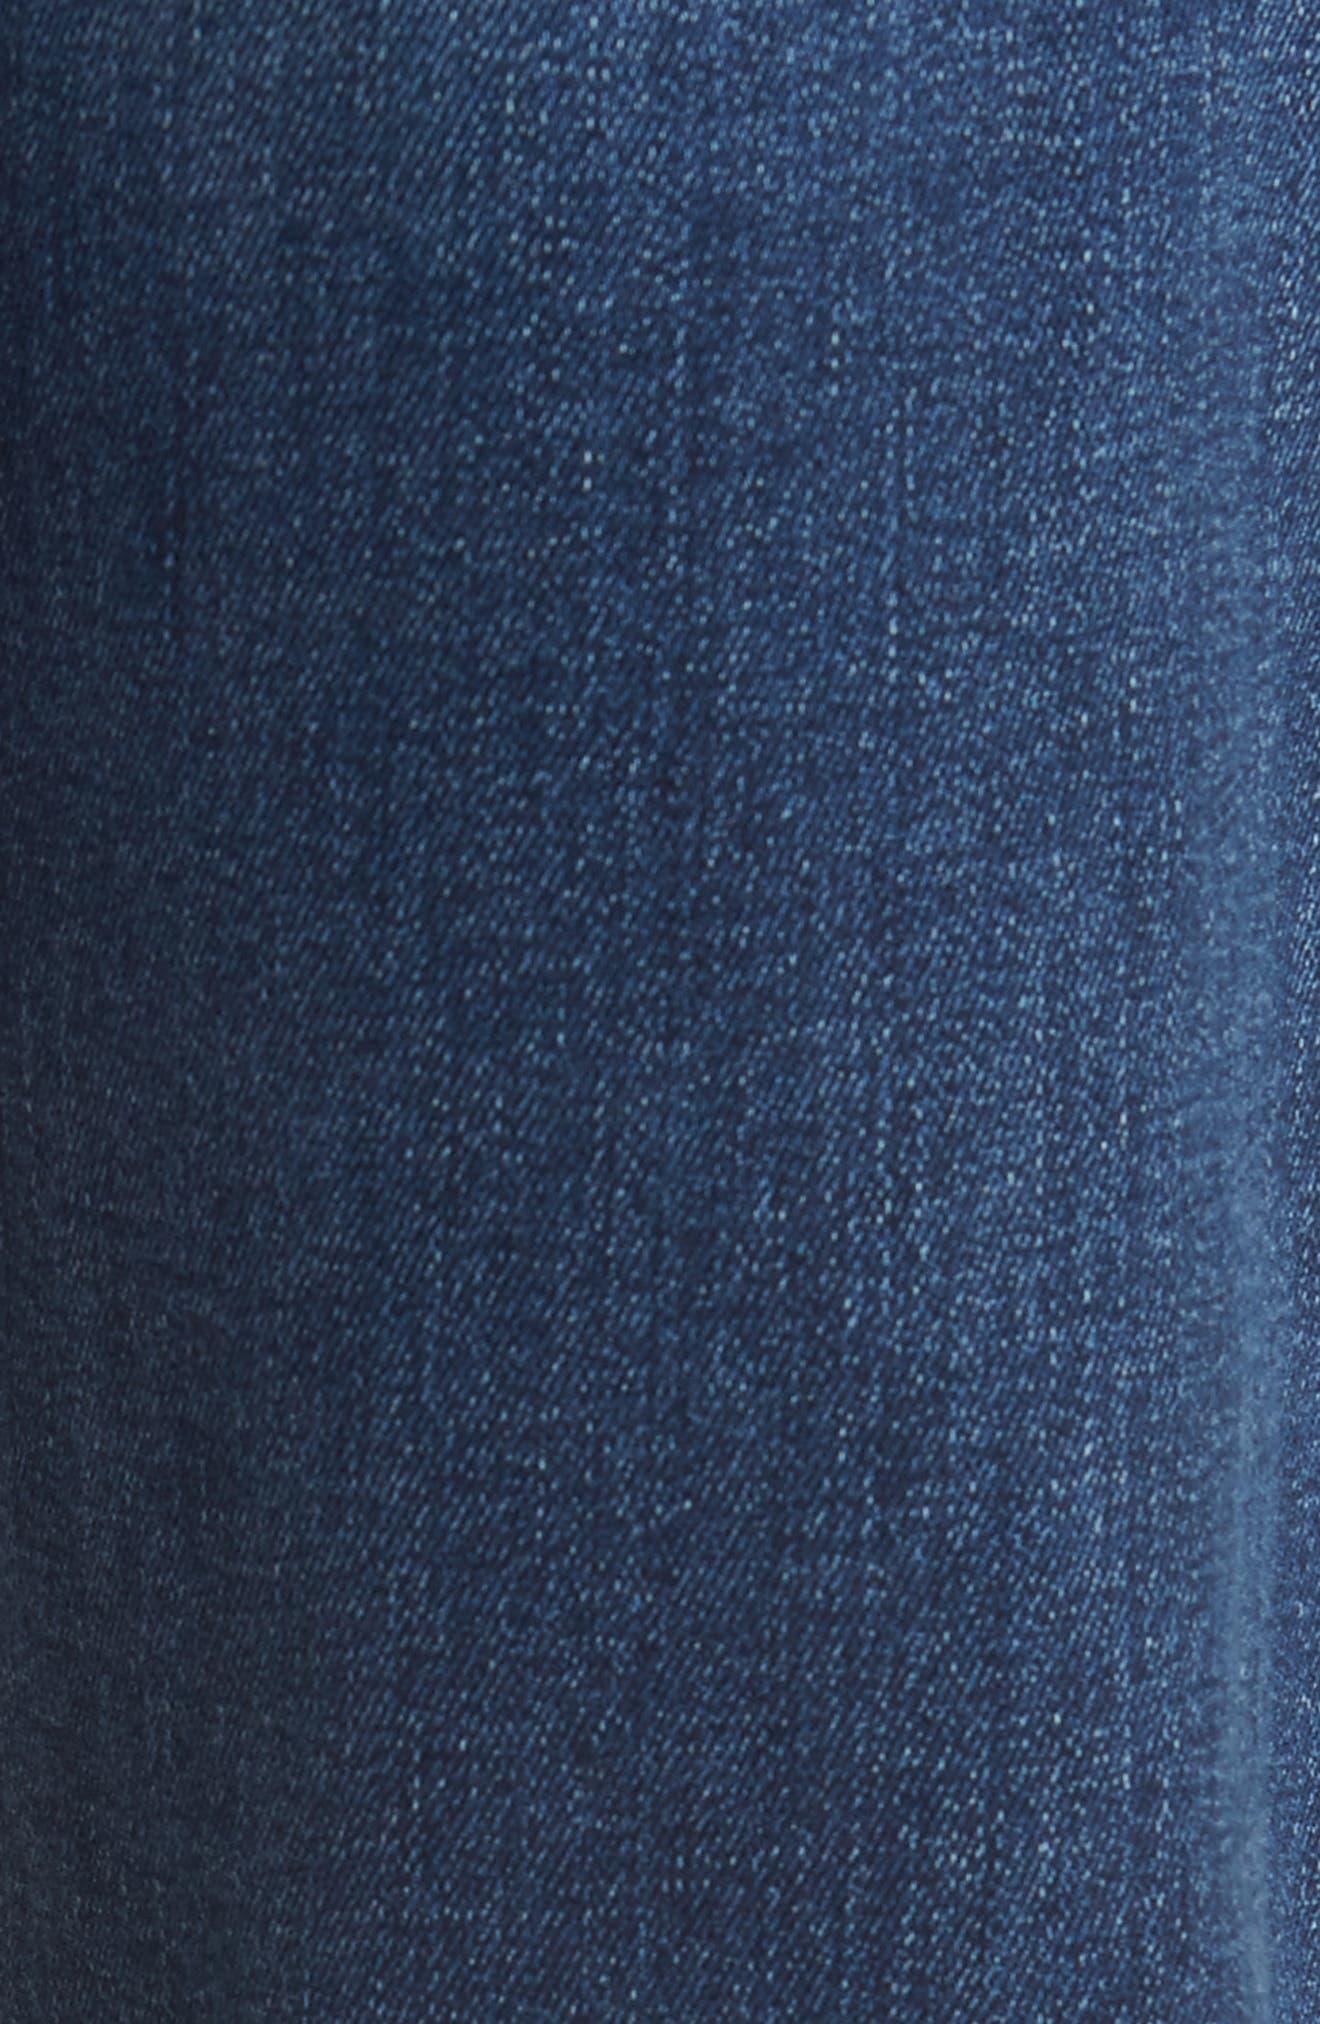 Slimmy Slim Fit Jeans,                             Alternate thumbnail 5, color,                             407